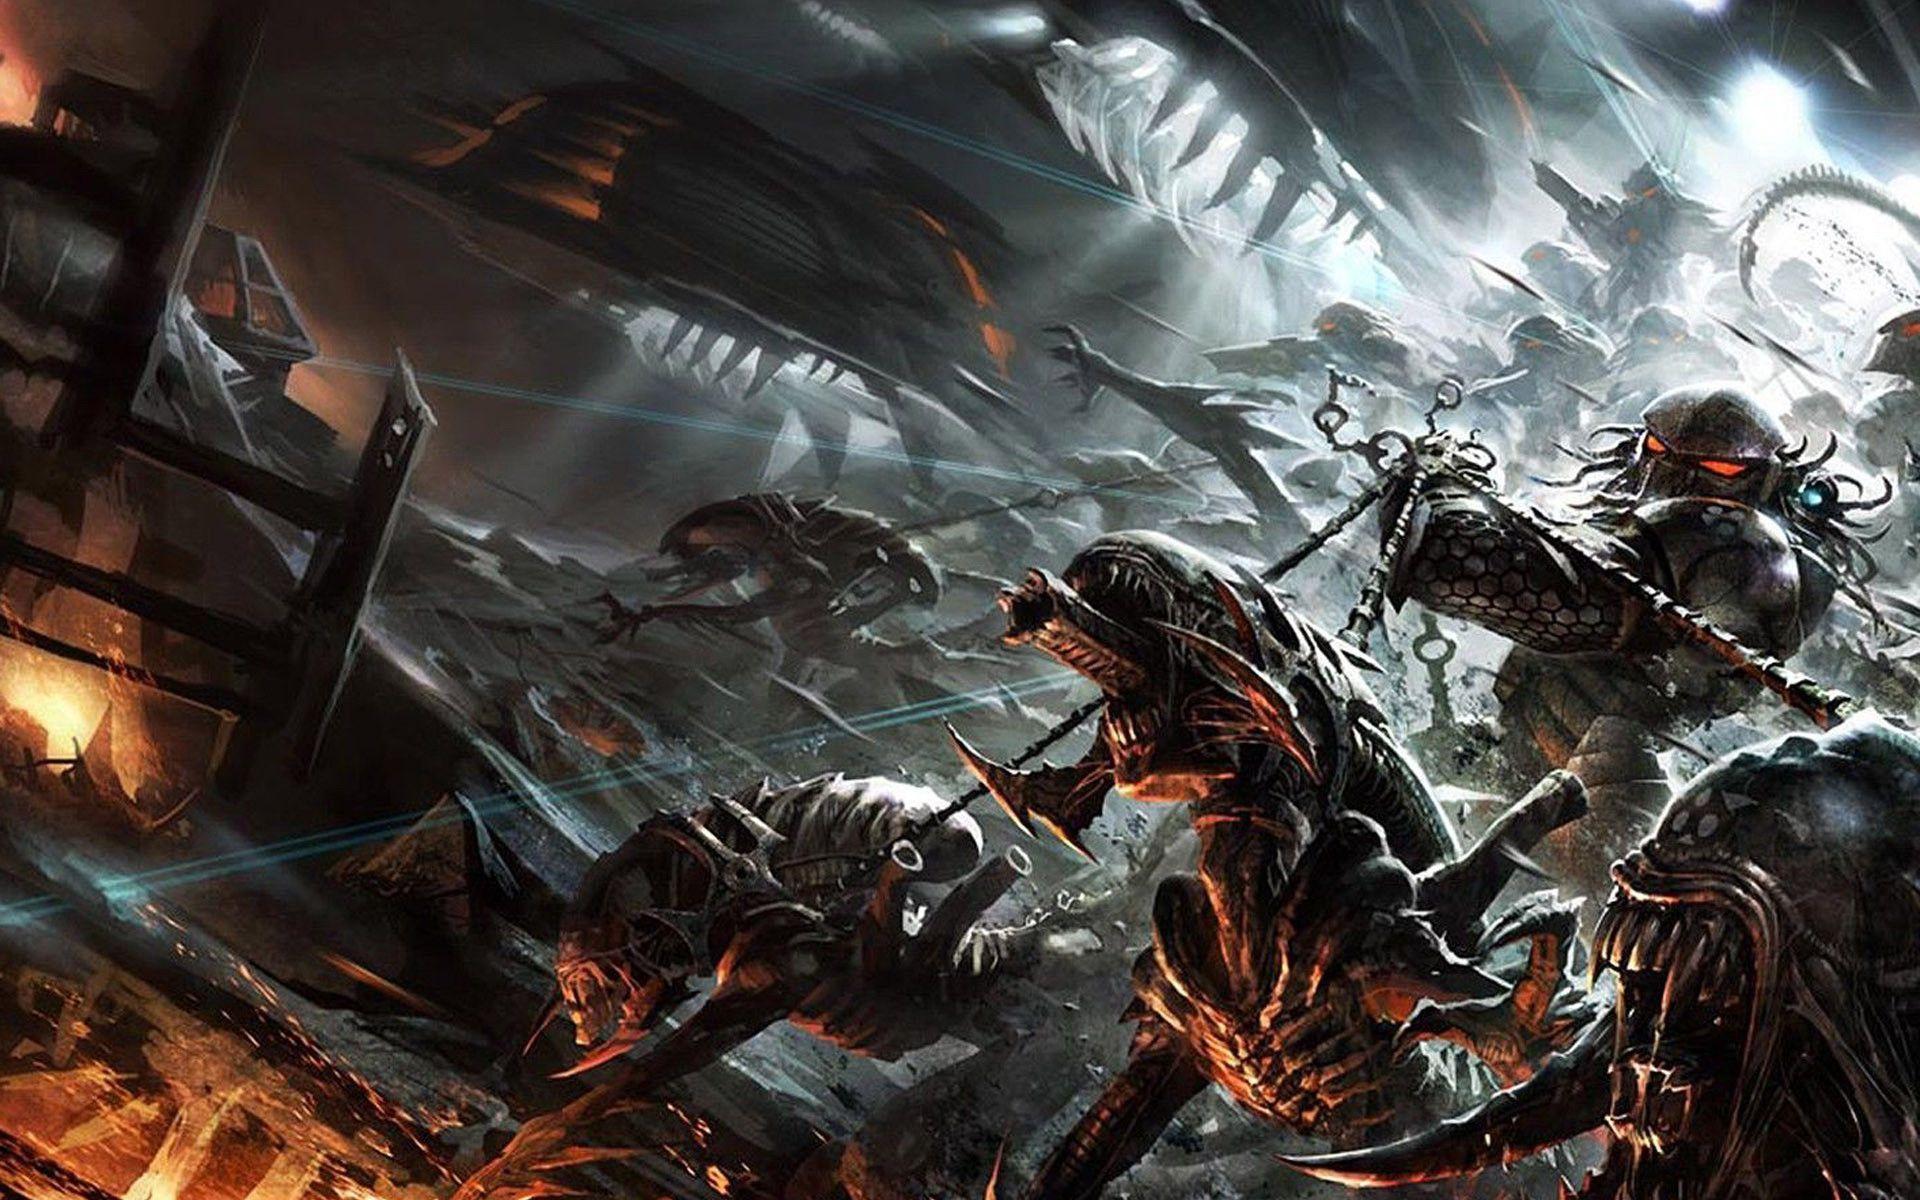 Widescreen patch addon - Aliens vs Predator 2 - Mod DB